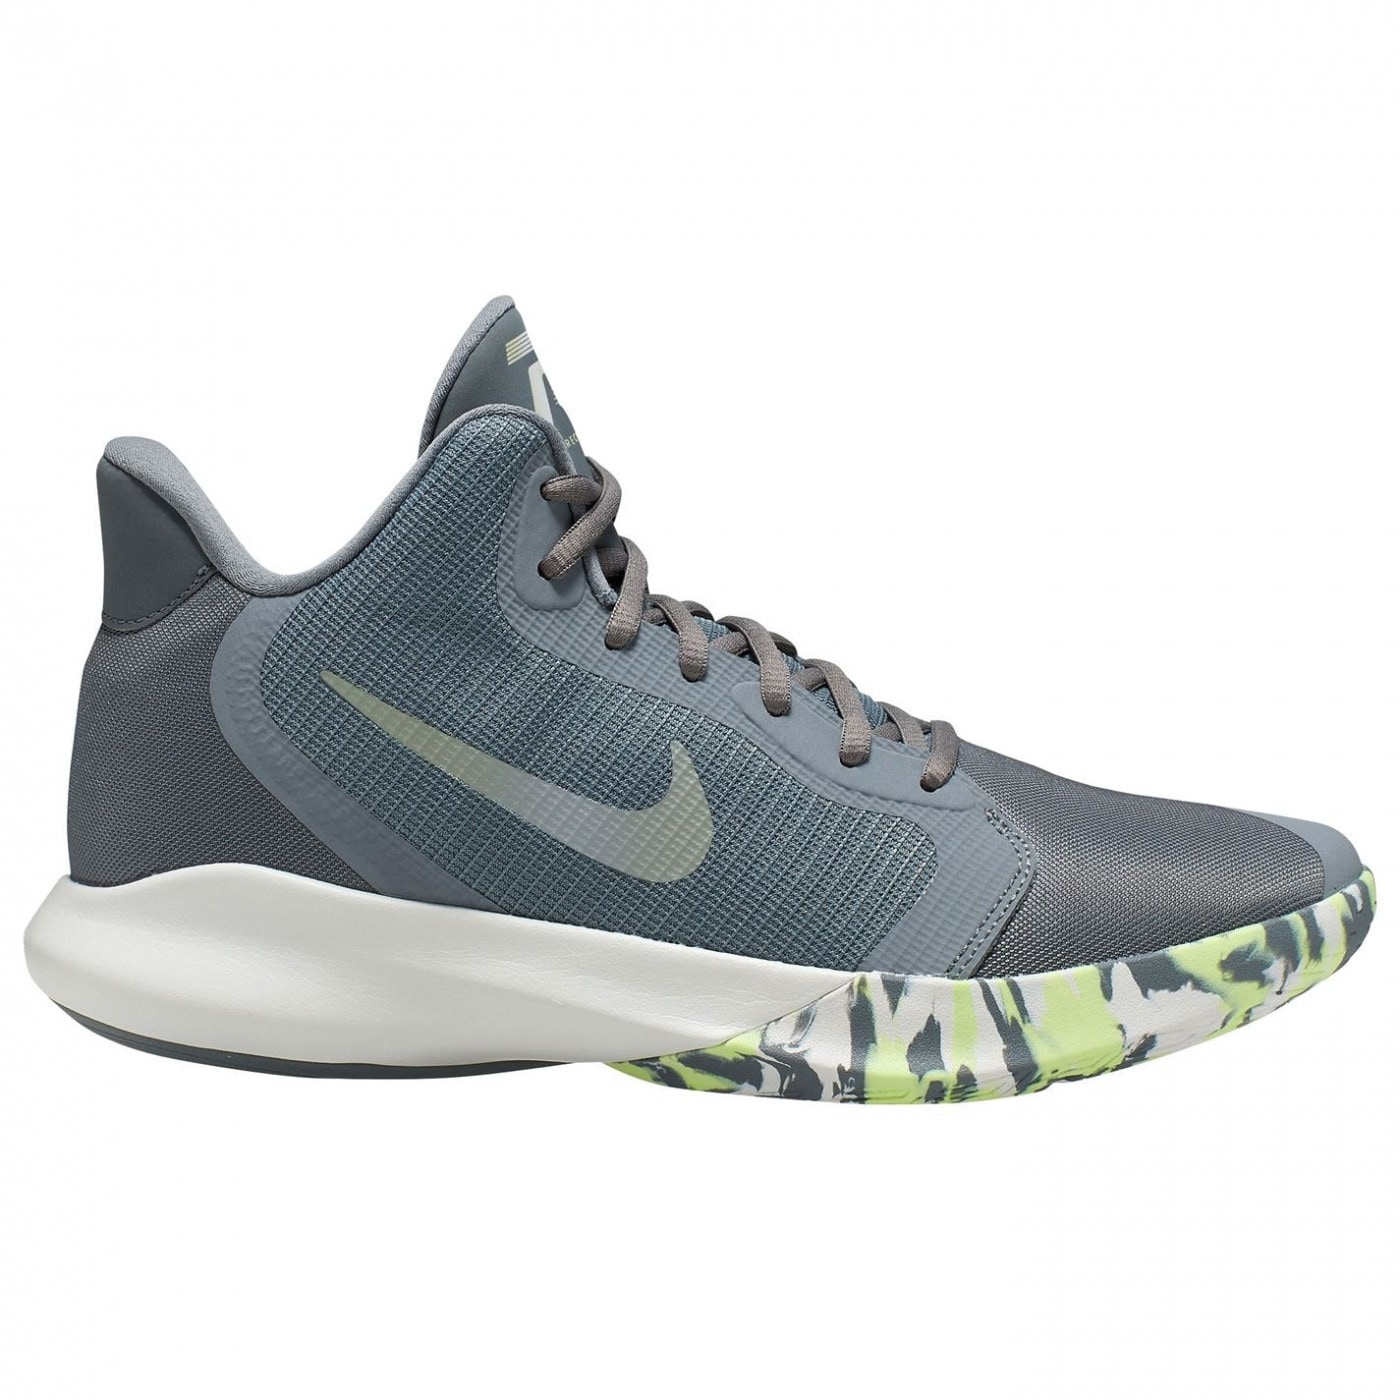 Men's trainers Nike Precision 3